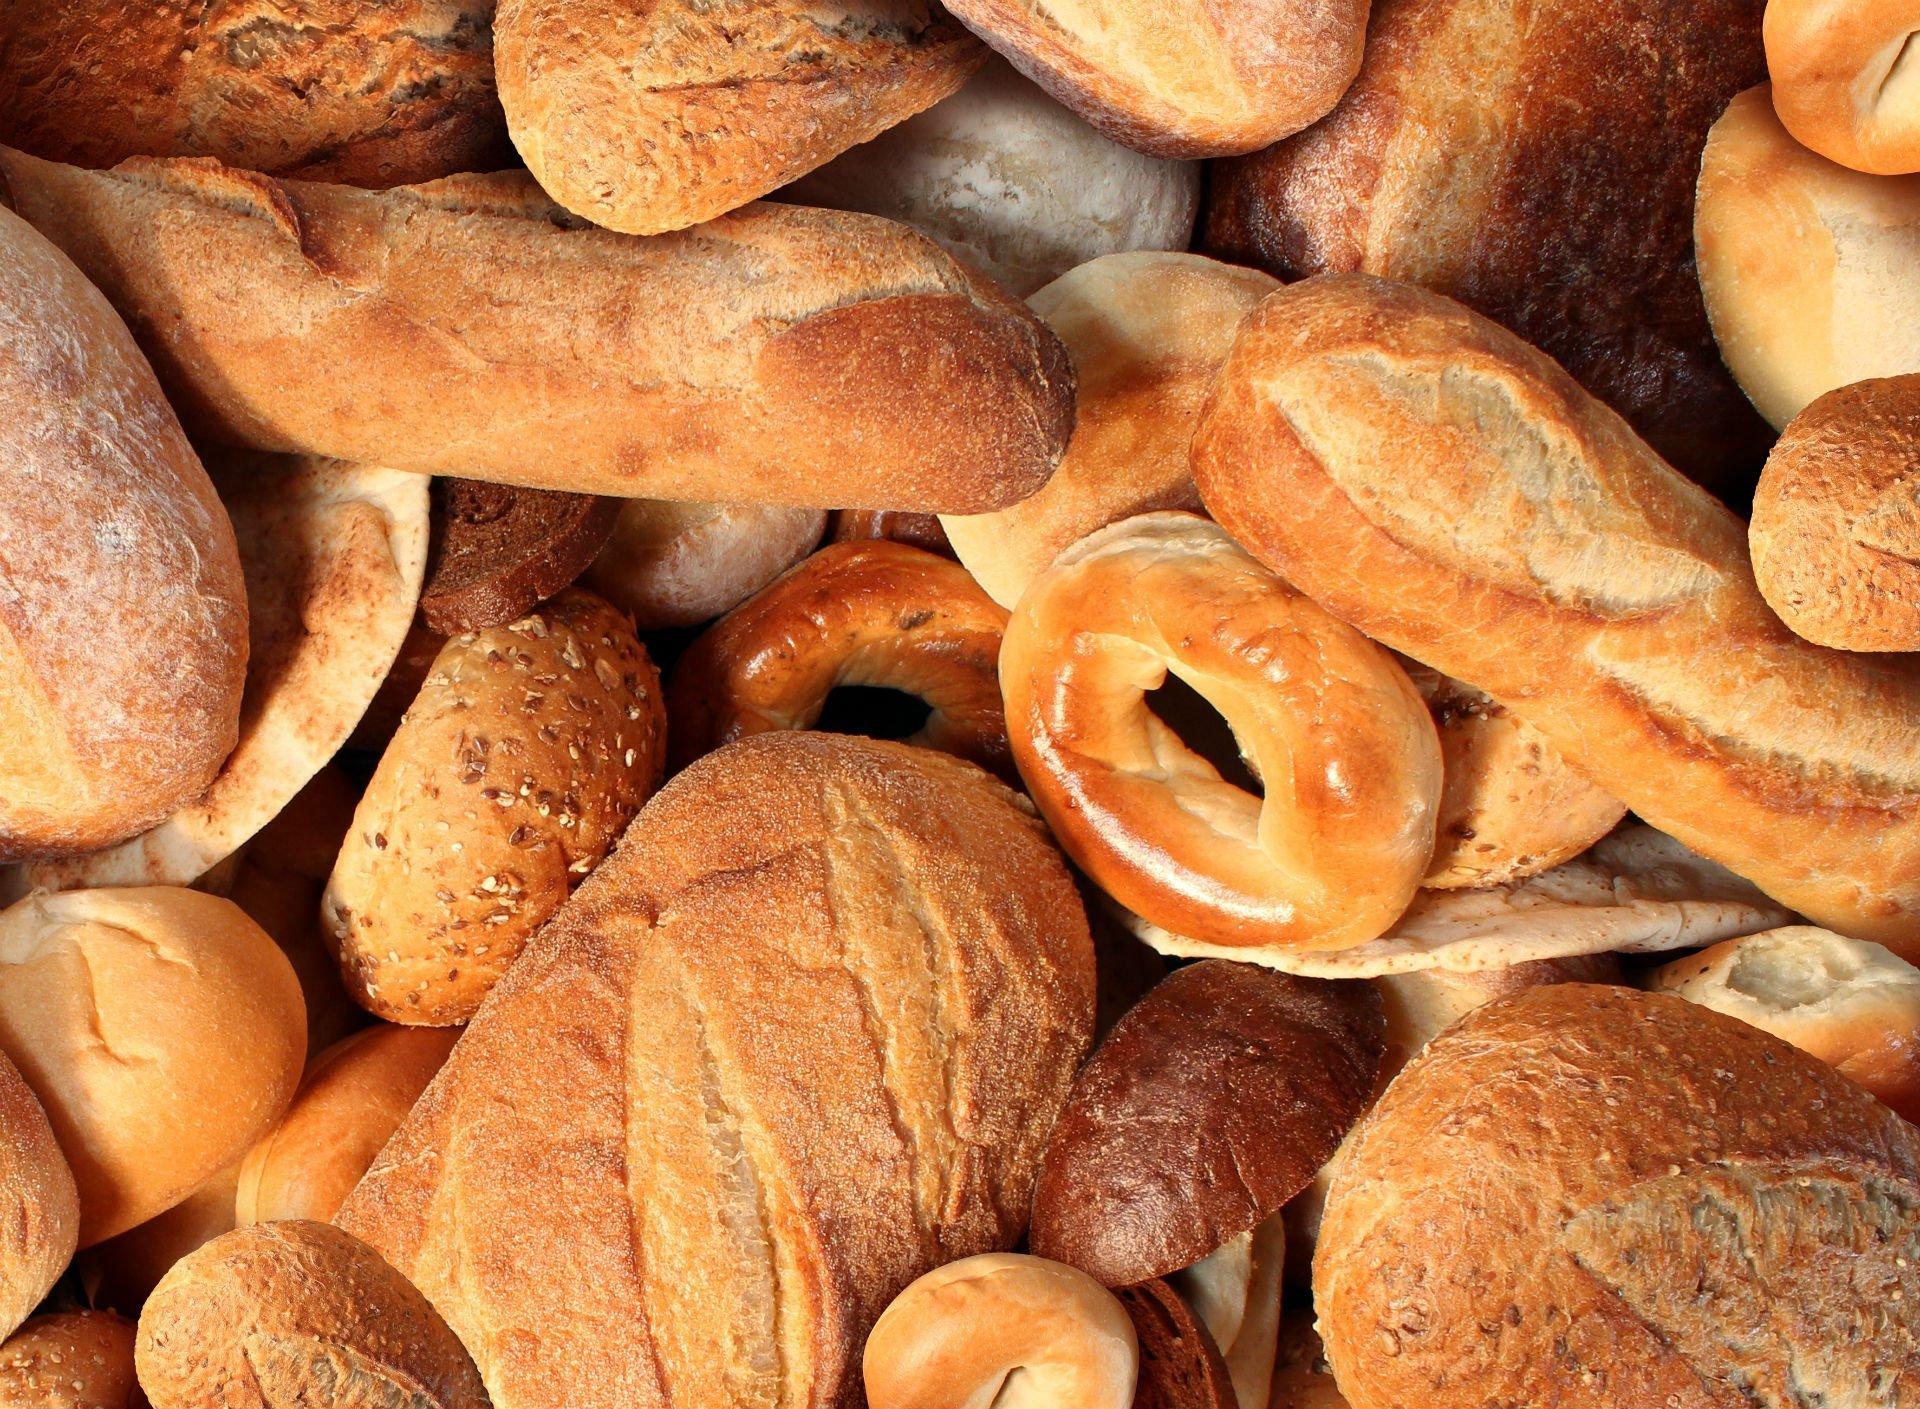 del pane